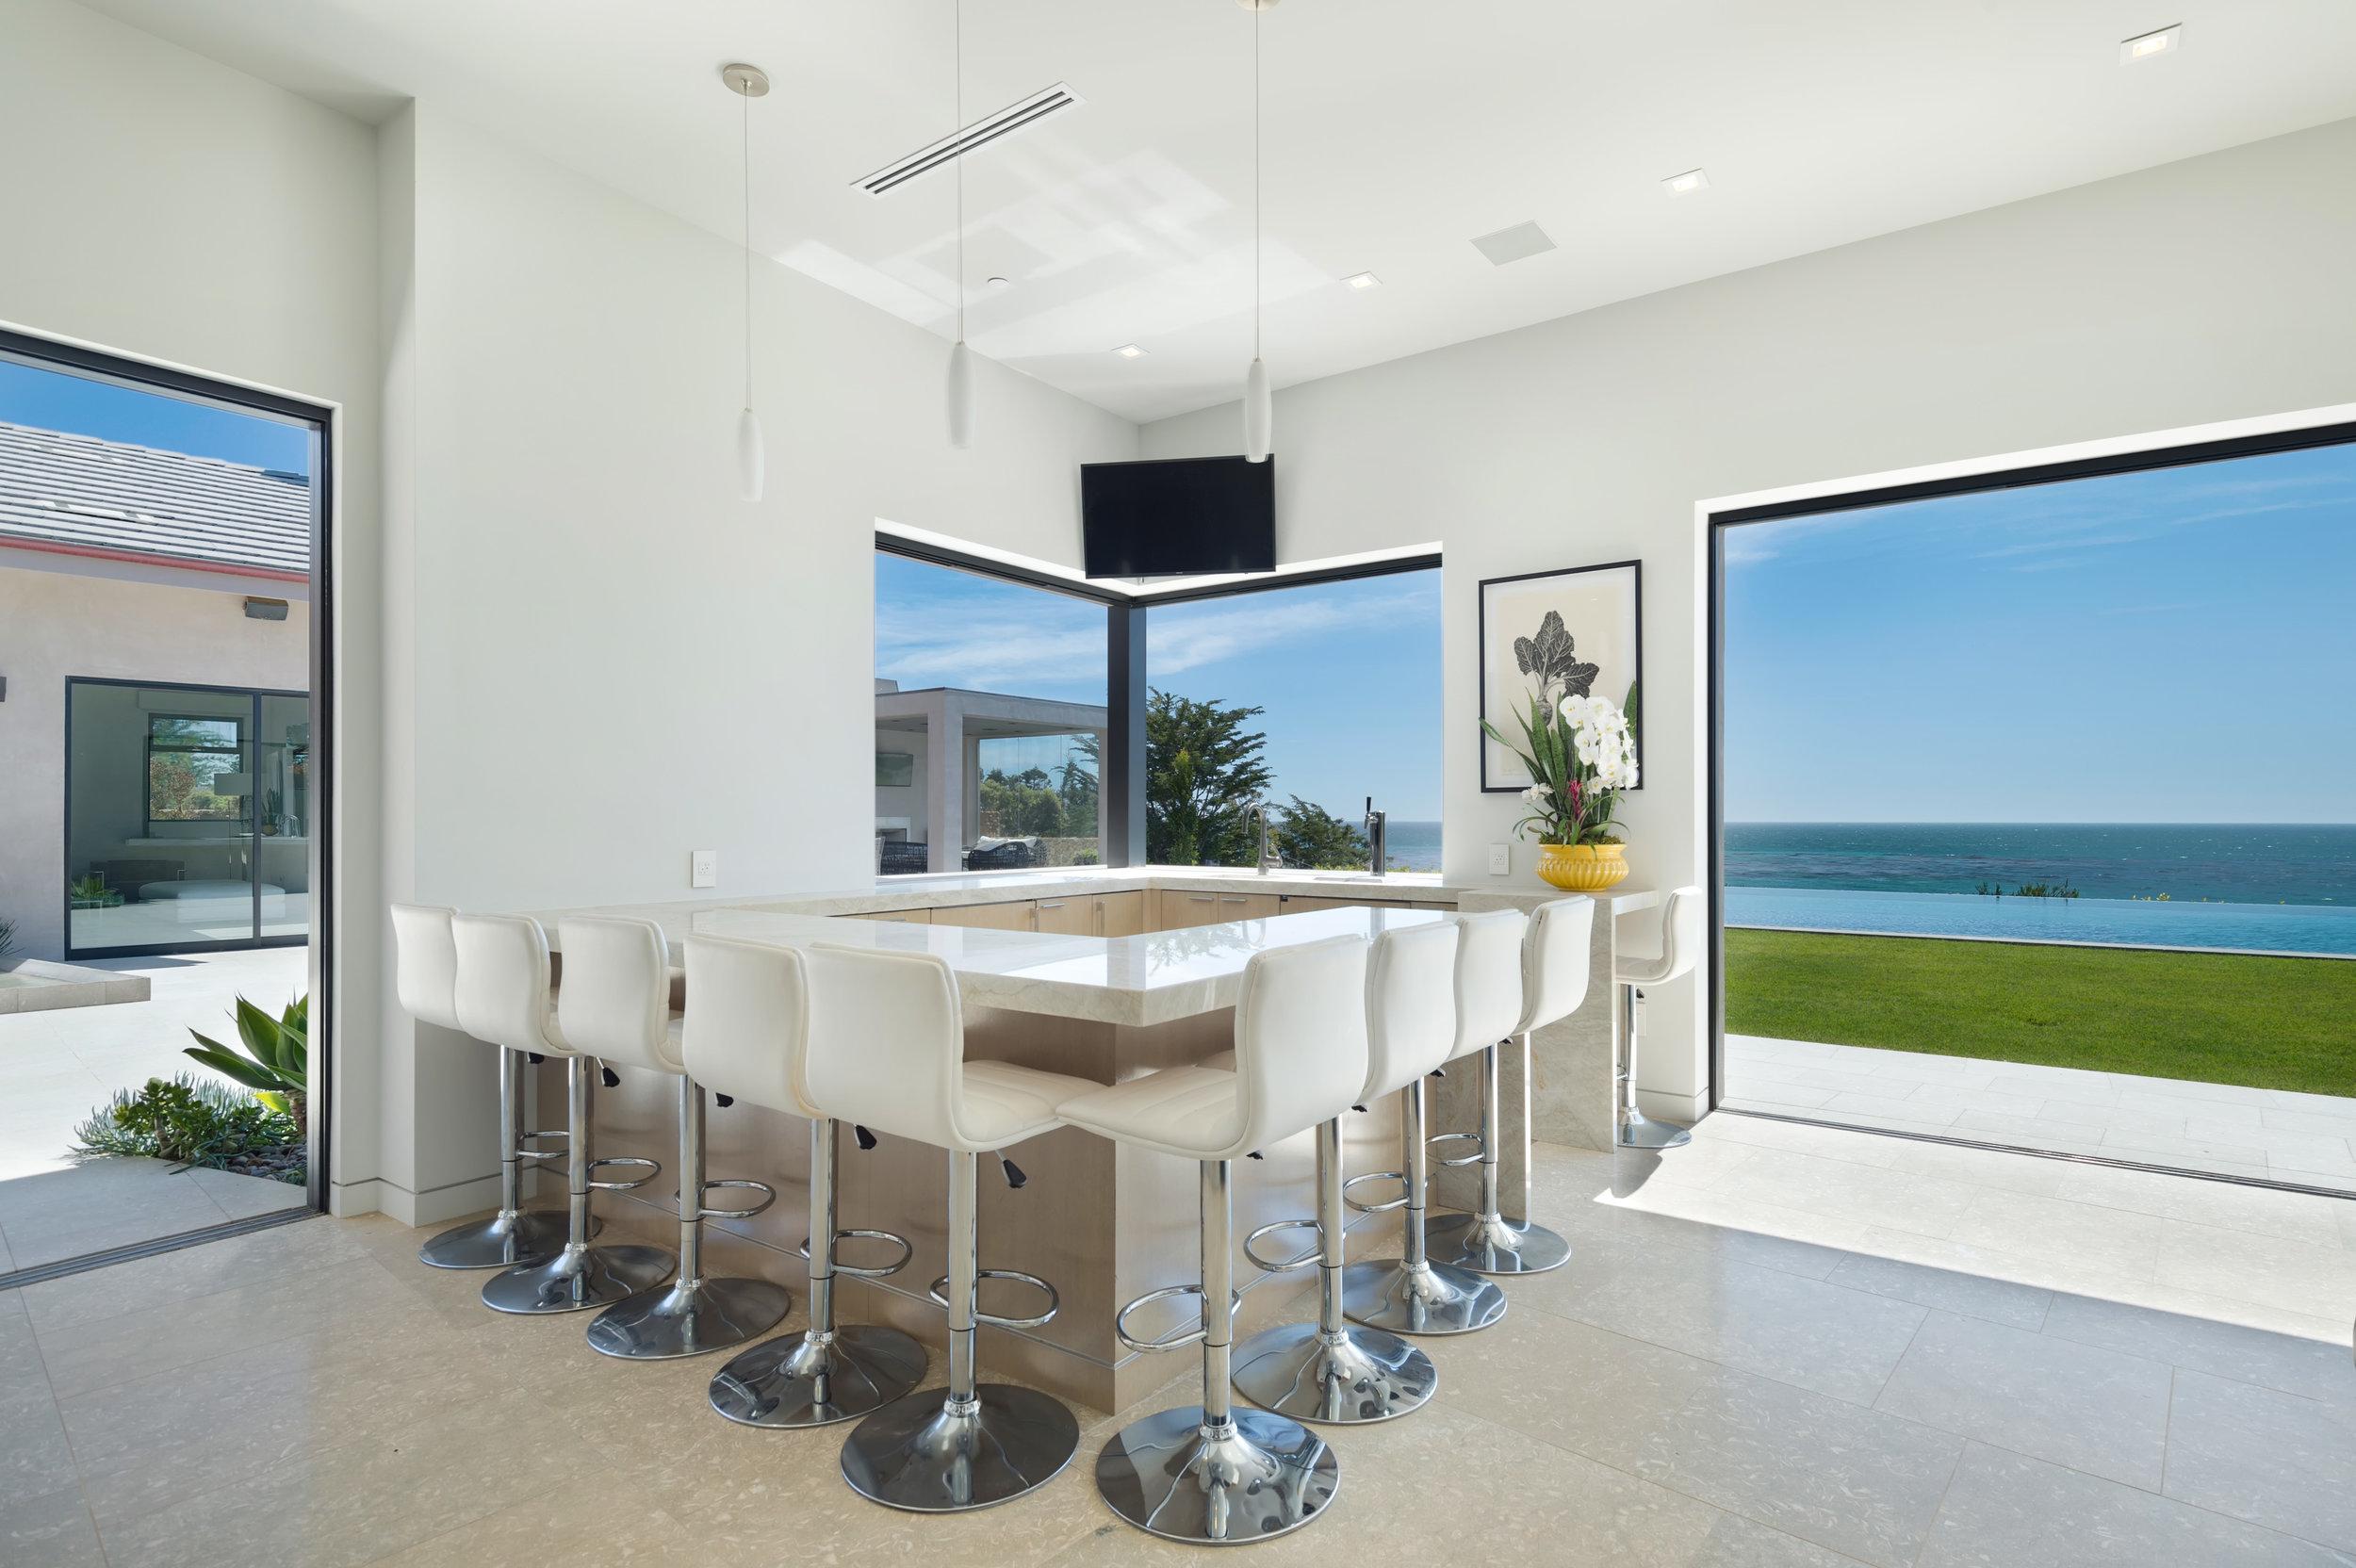 011 bar 11902 Ellice Street Malibu For Sale The Malibu Life Team Luxury Real Estate.jpg